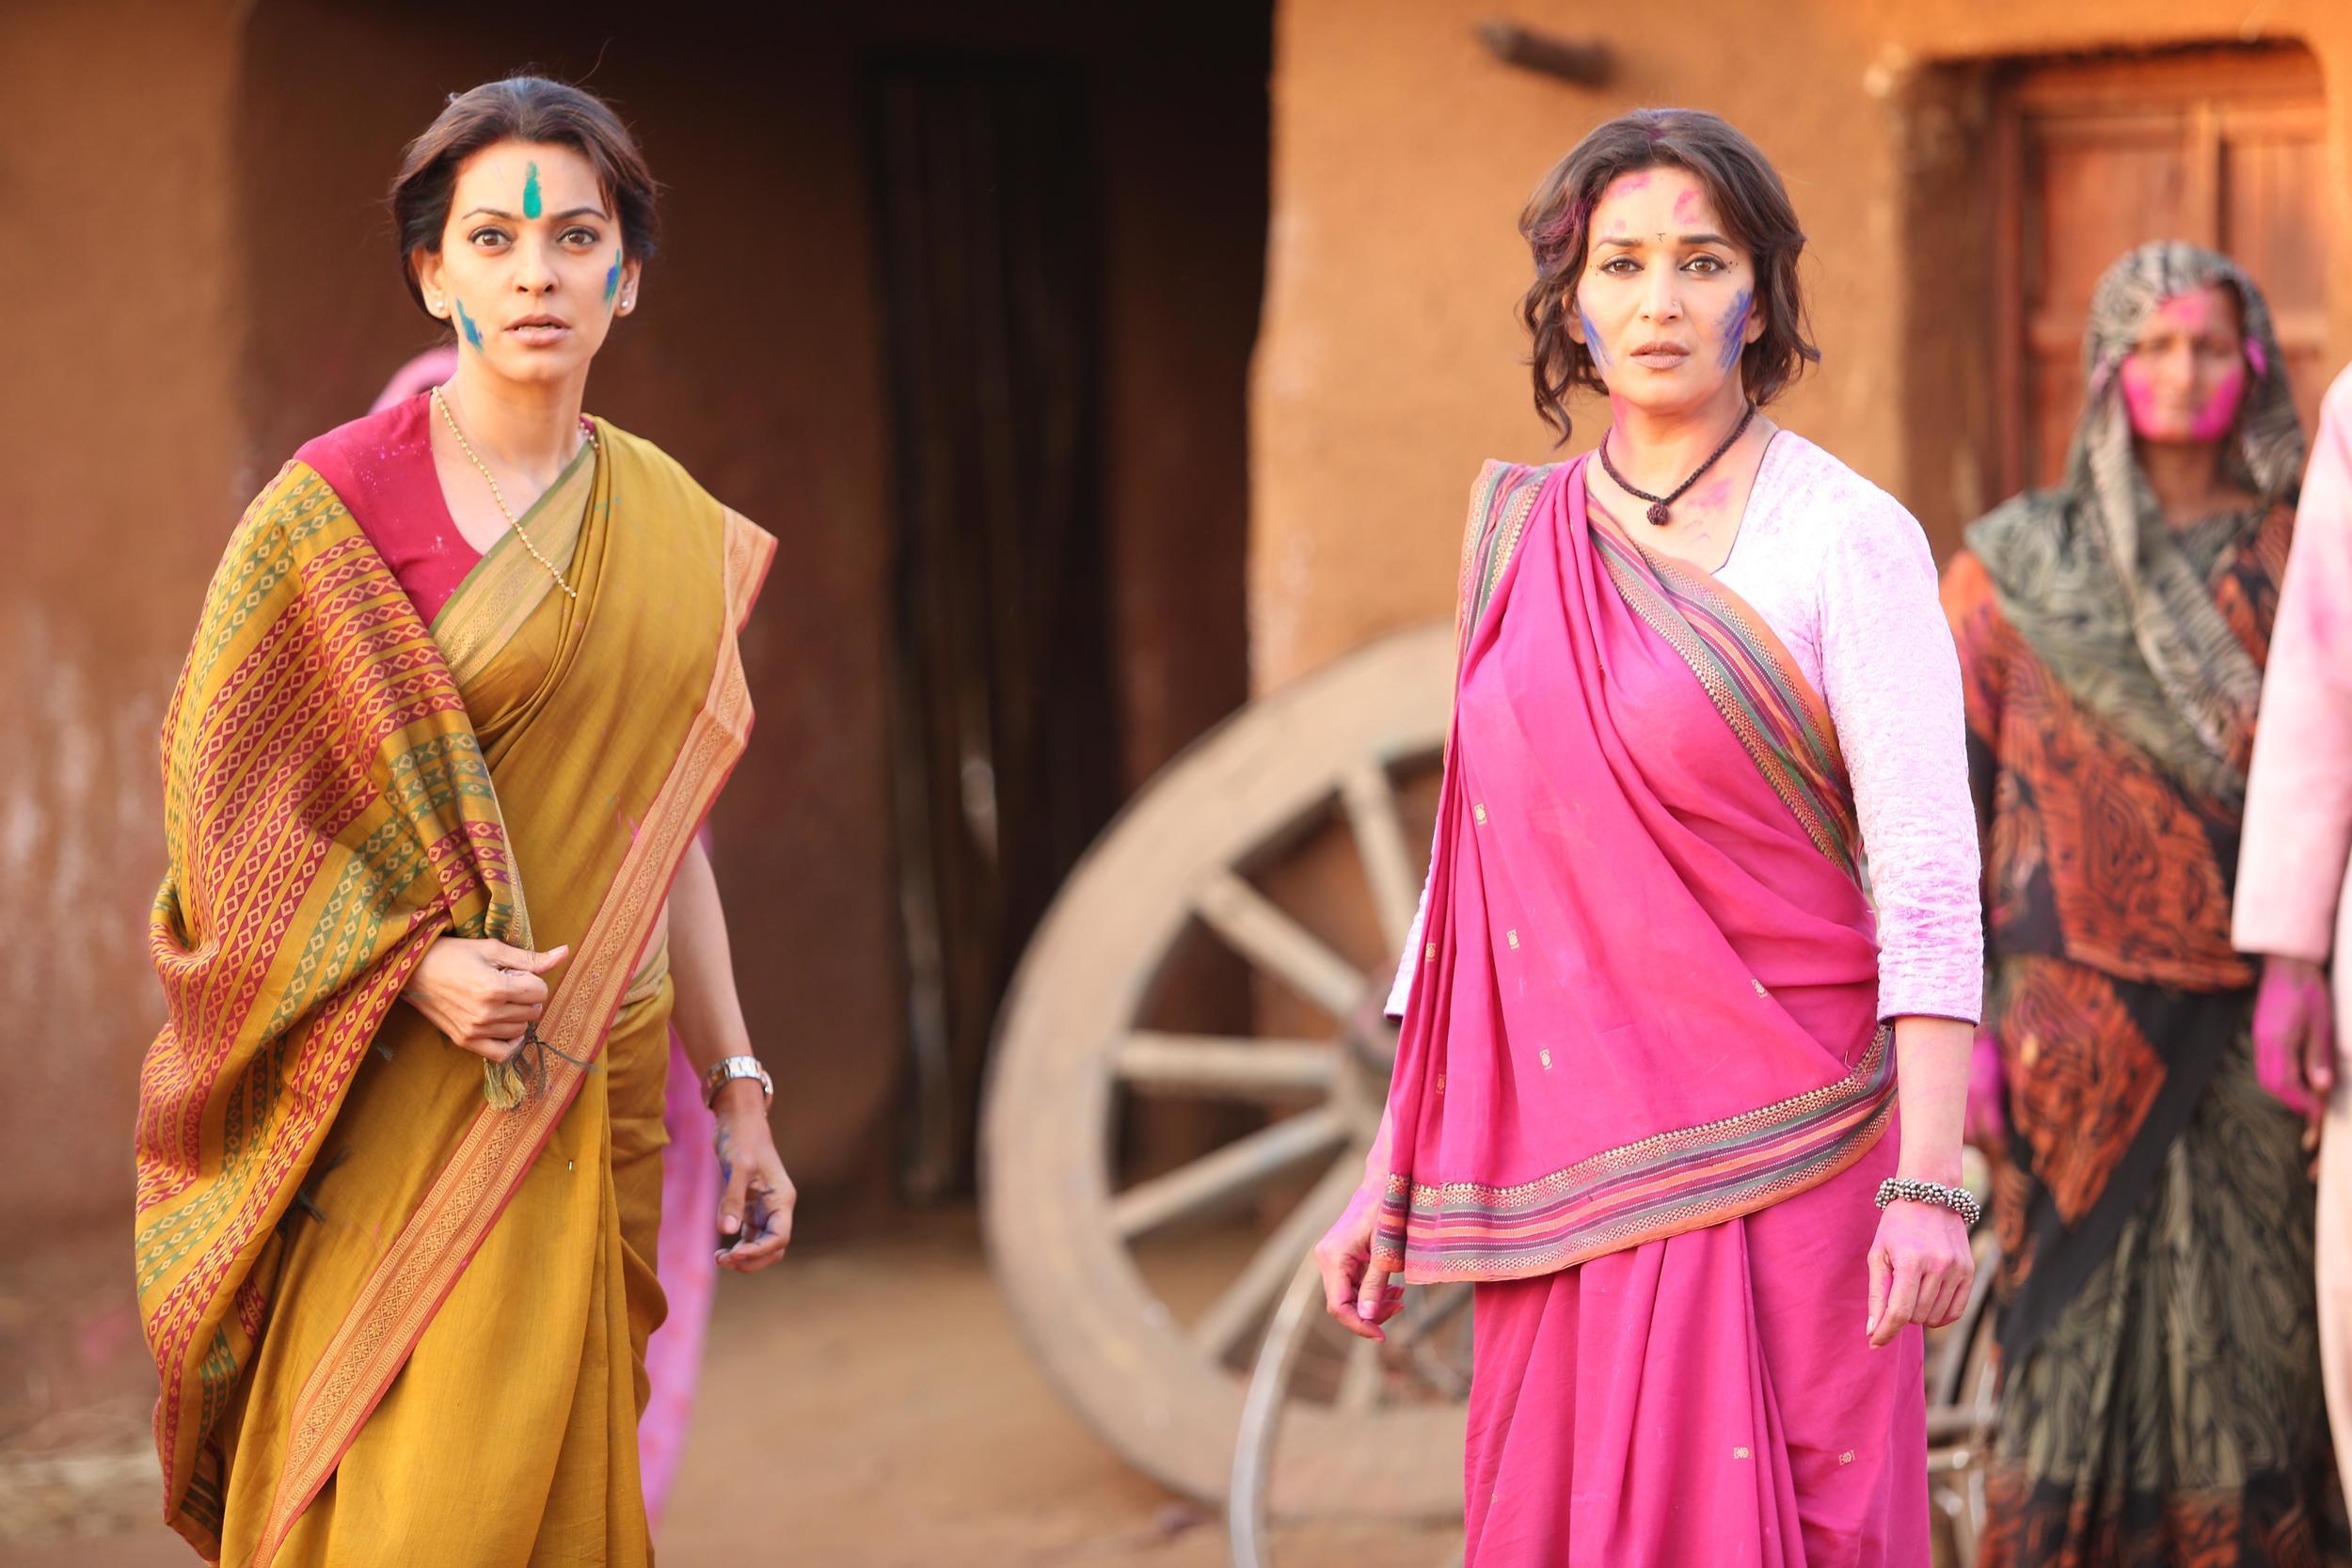 Madhuri Dixit and Juhi Chawla in Gulab Gang (2).jpg